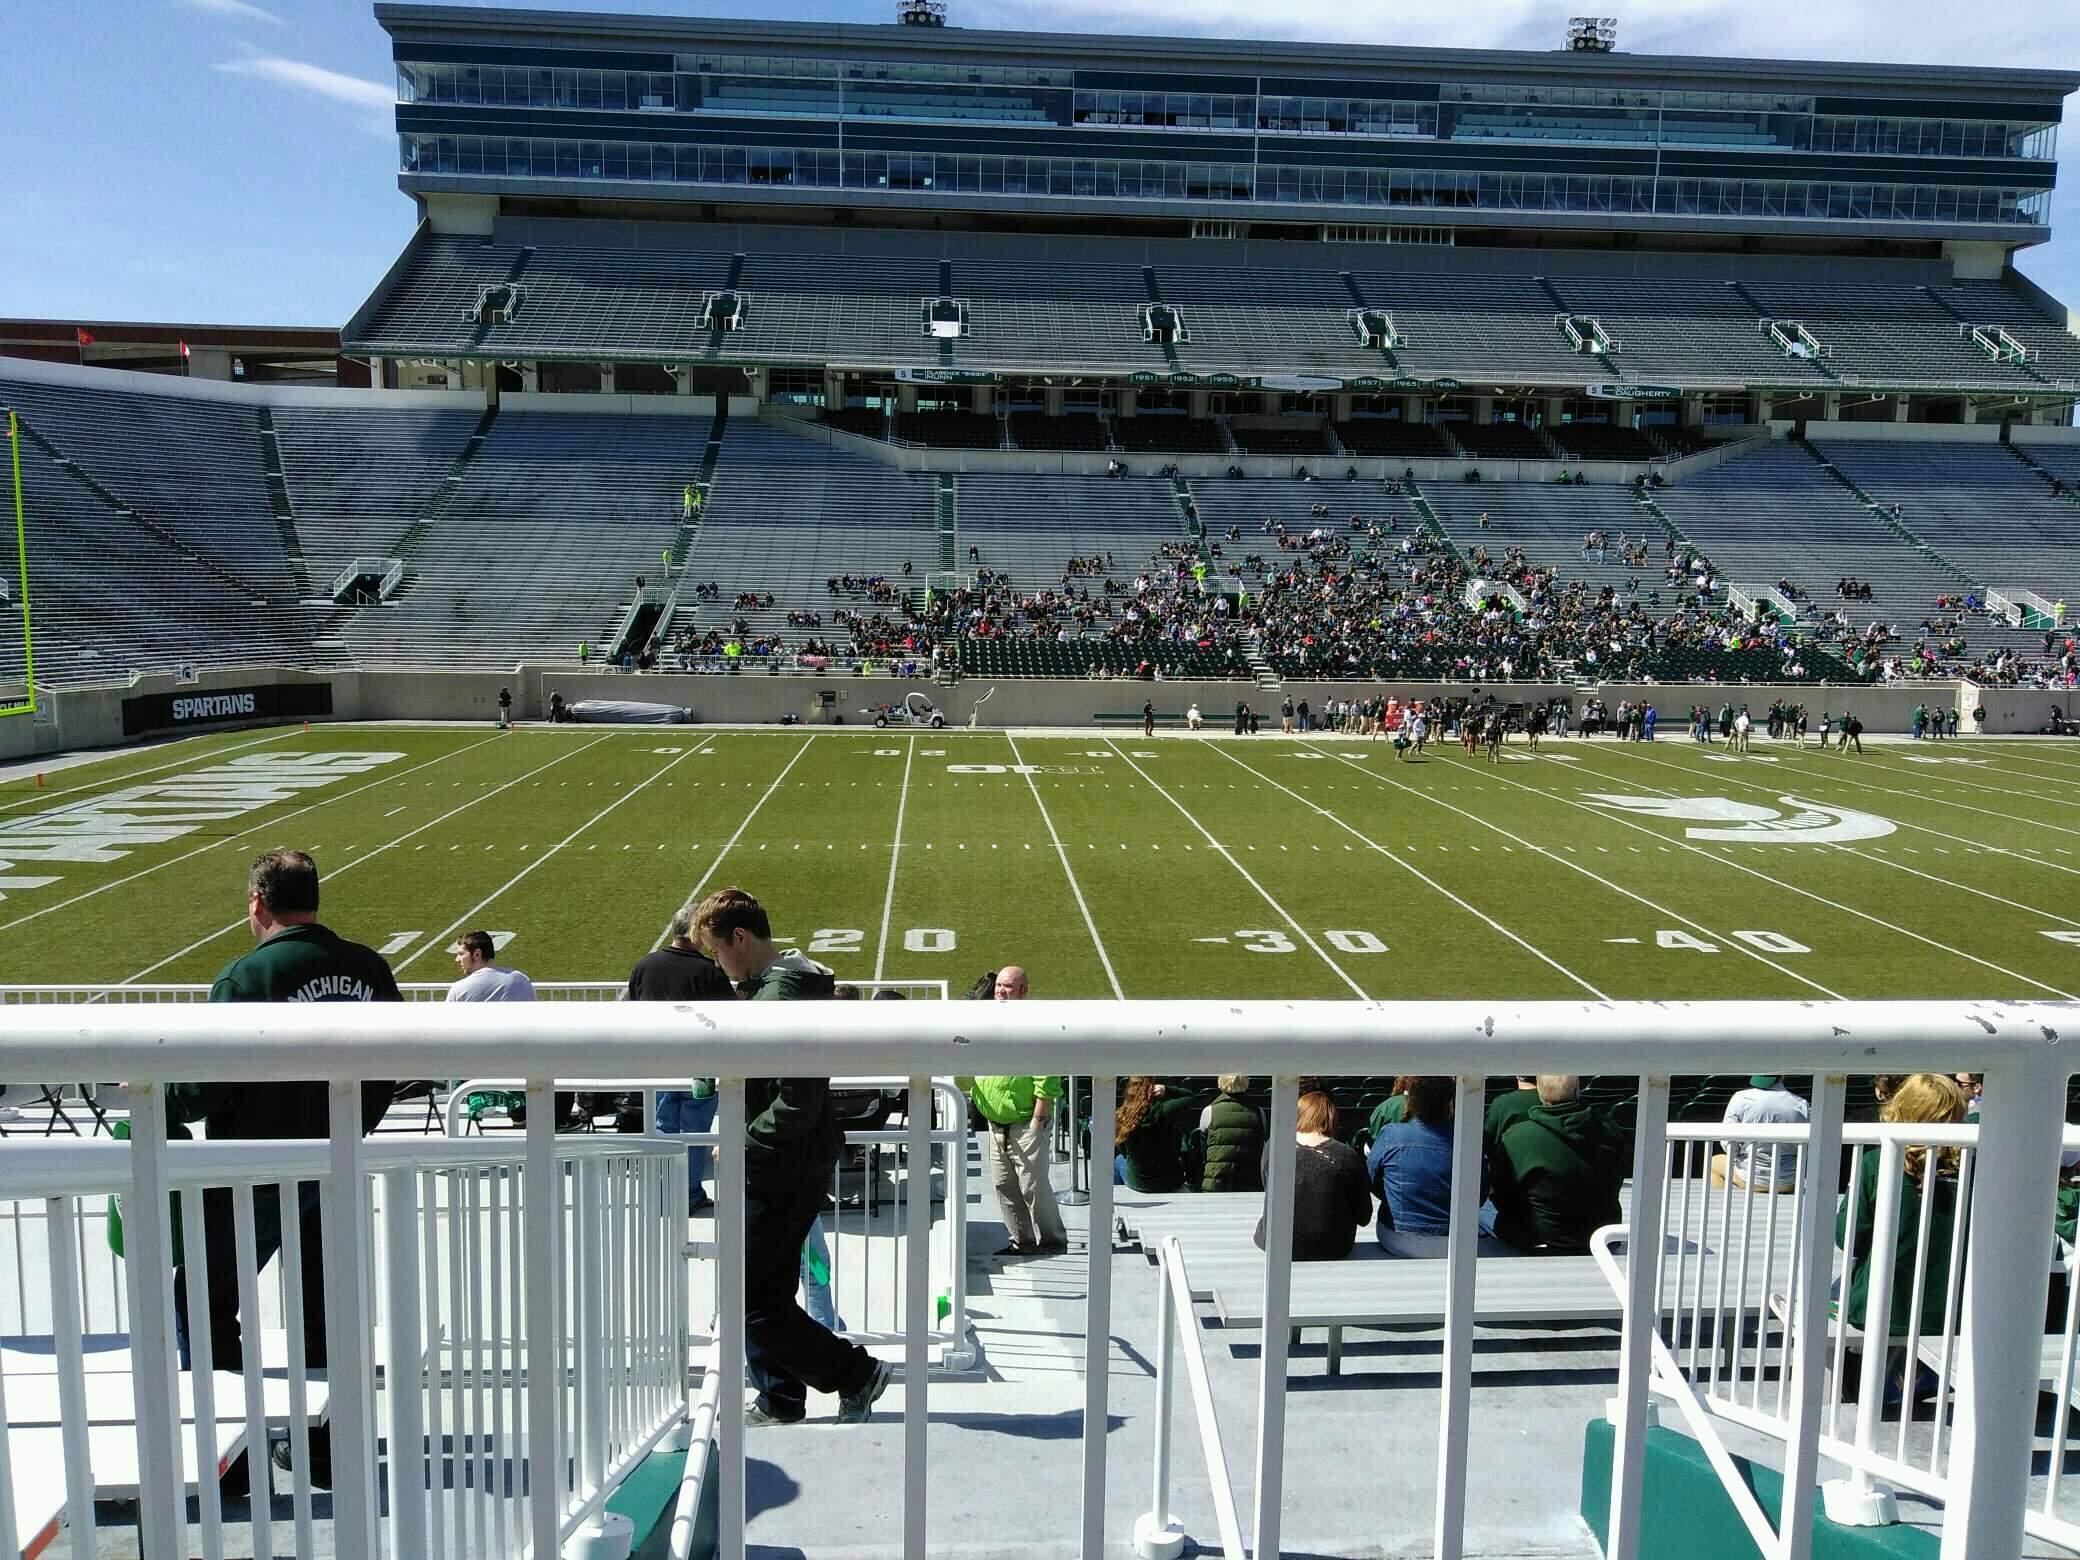 Spartan Stadium Section 10 Row 27 Seat 19